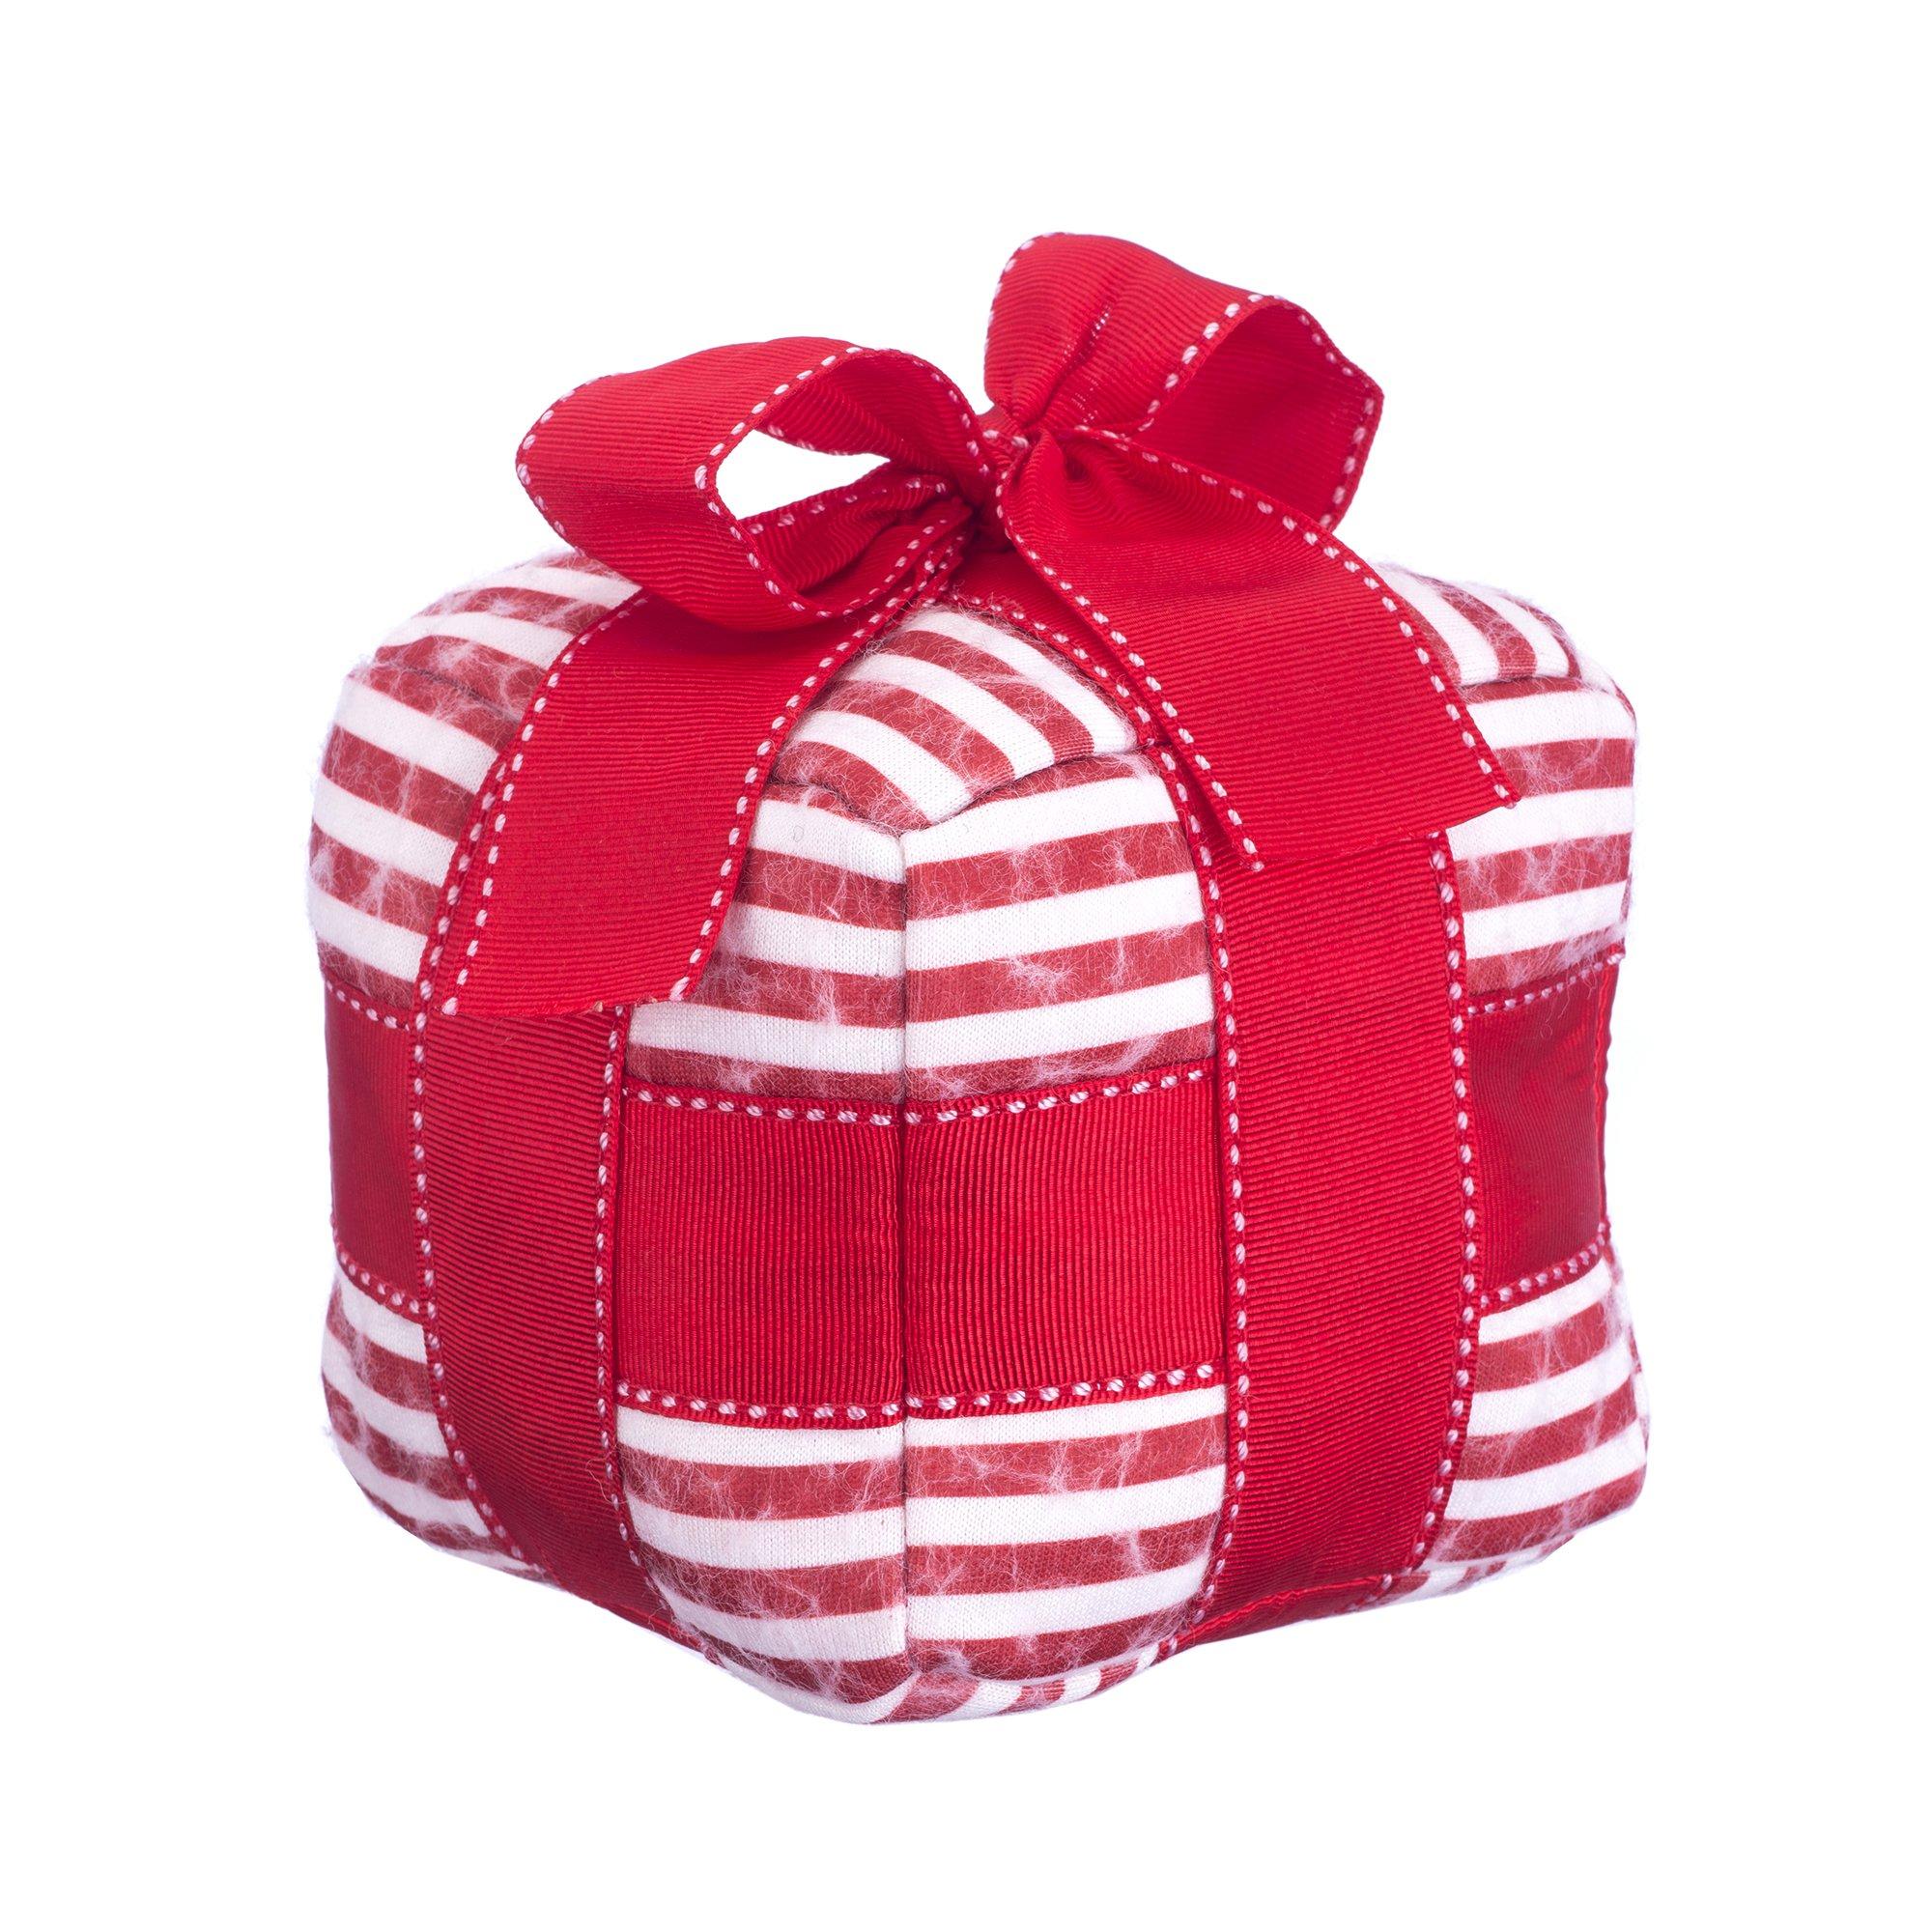 Jax and Bones Holiday Gift Woolie Dog Squeak Toy, 5''